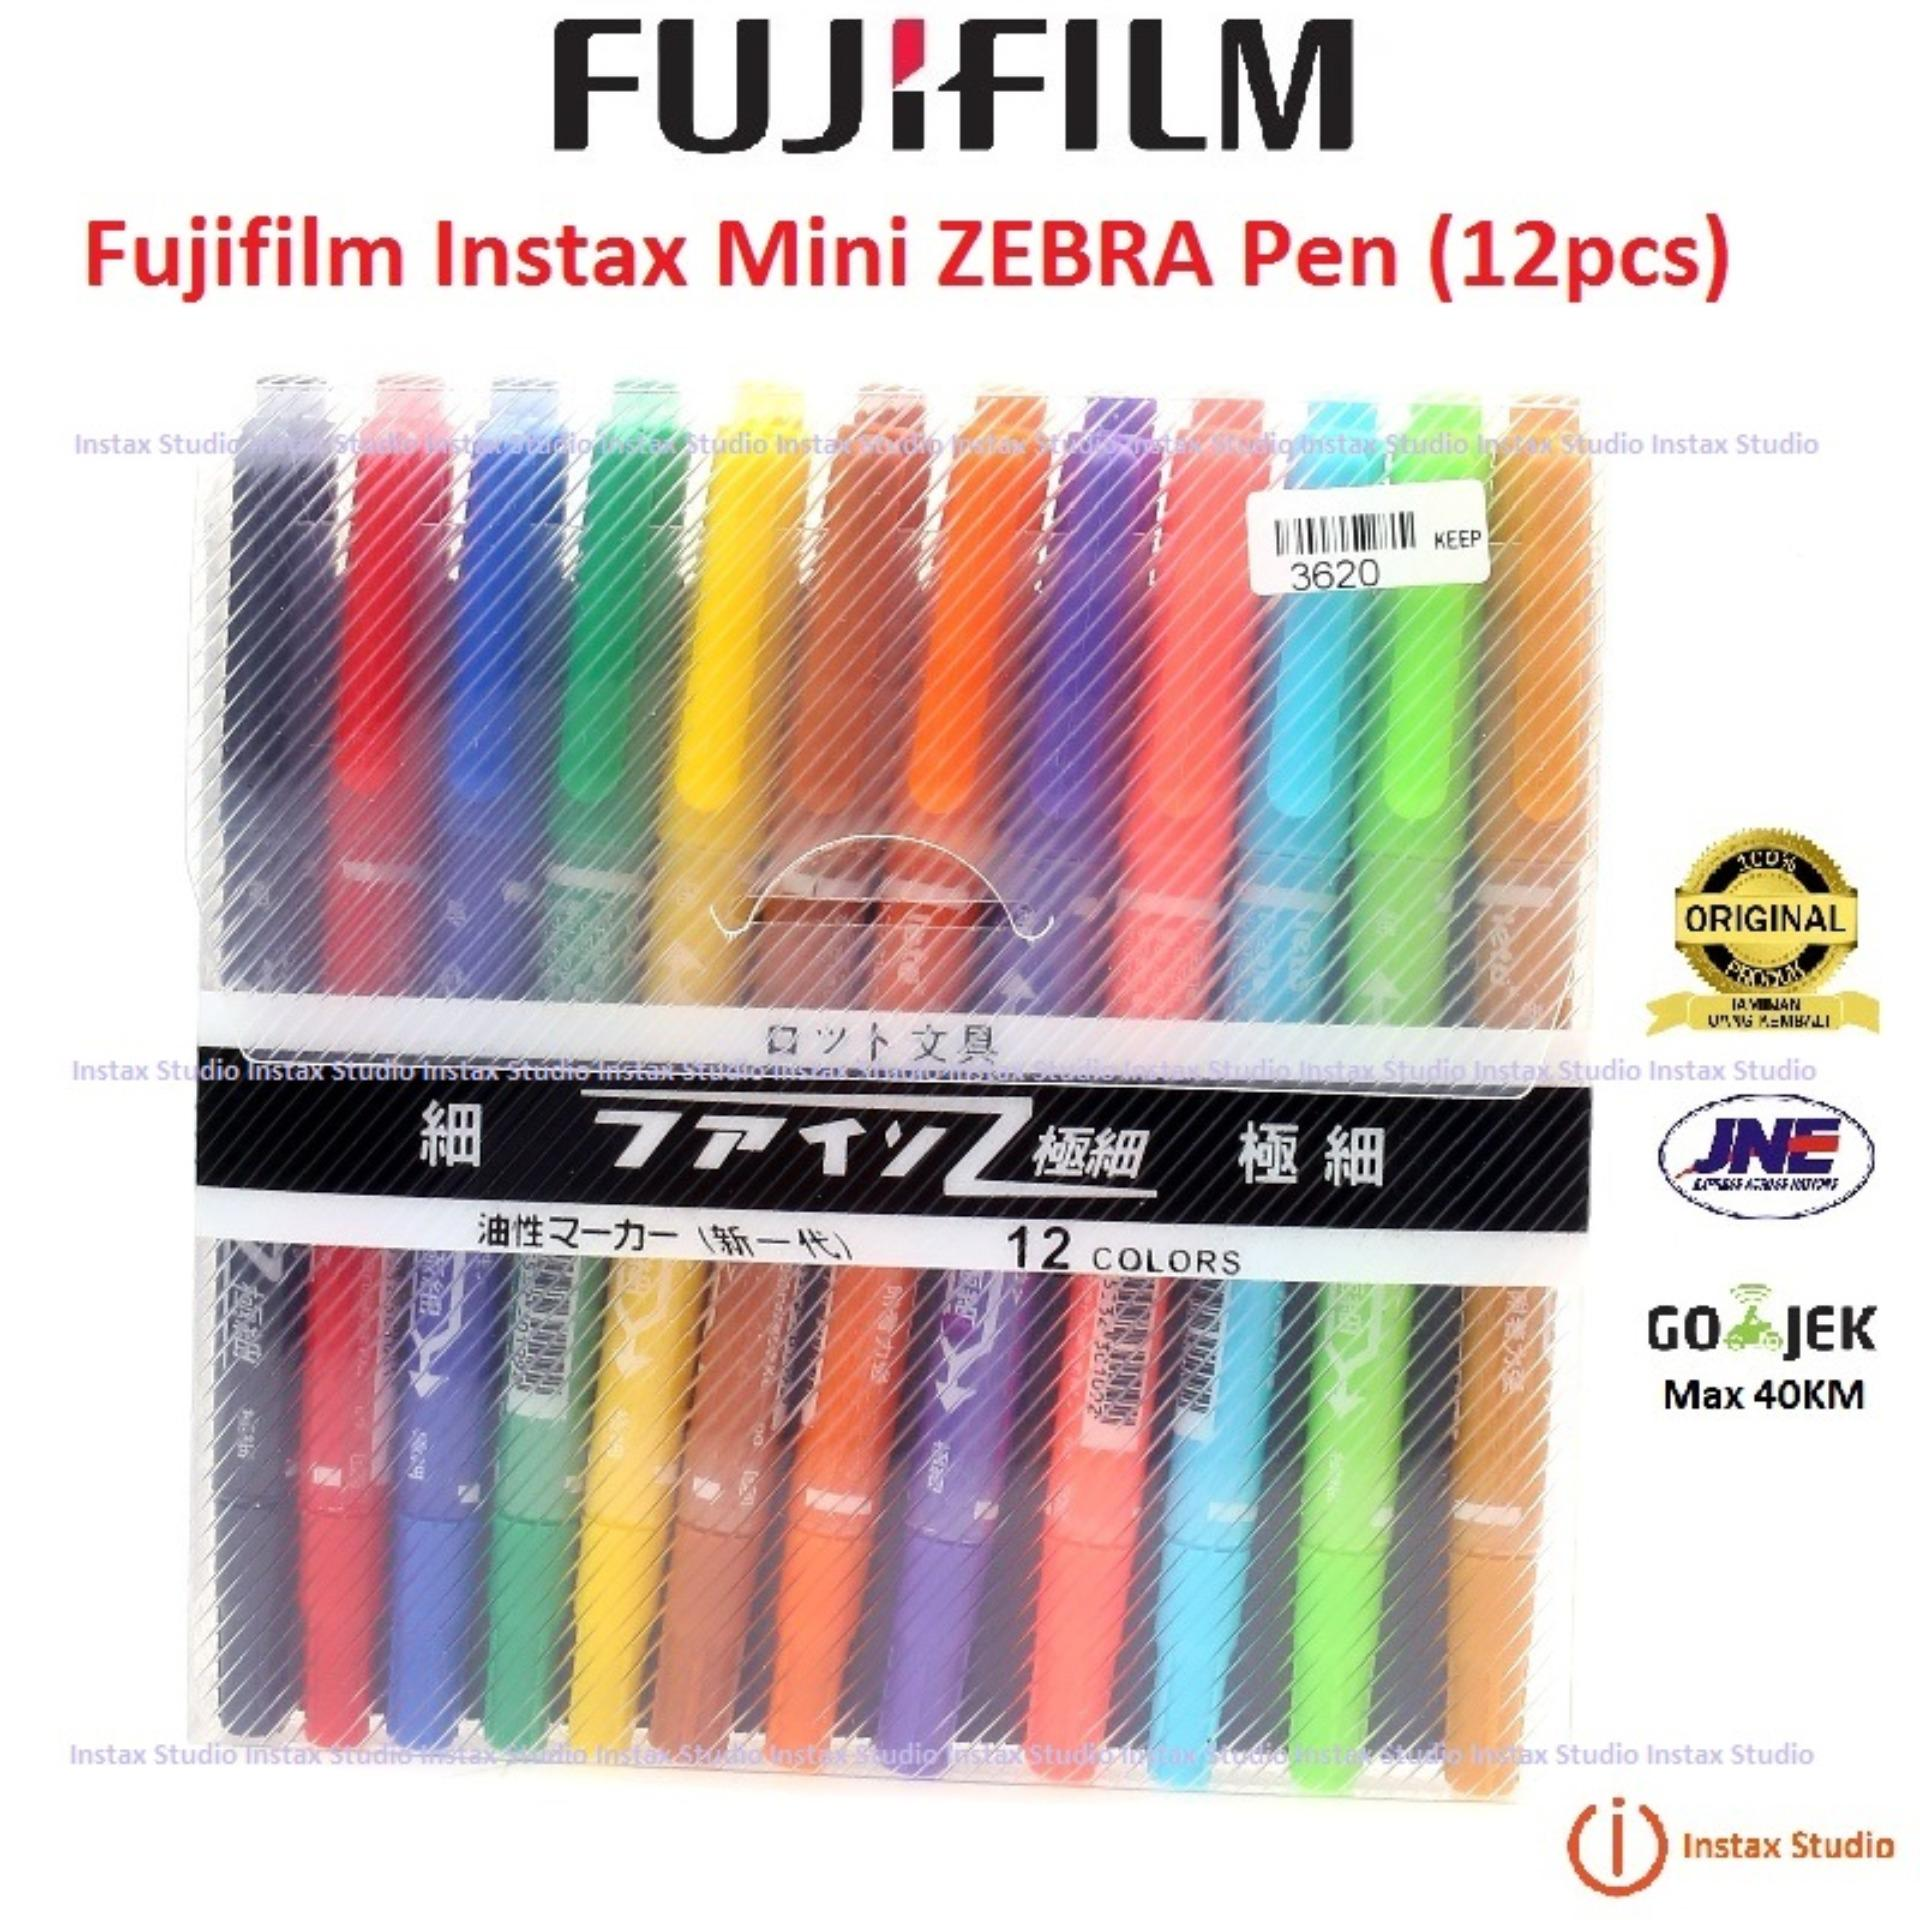 Diskon Fujifilm Instax Mini Zebra Pen Kamera Polaroid Instax Pena Zebra Instax Branded